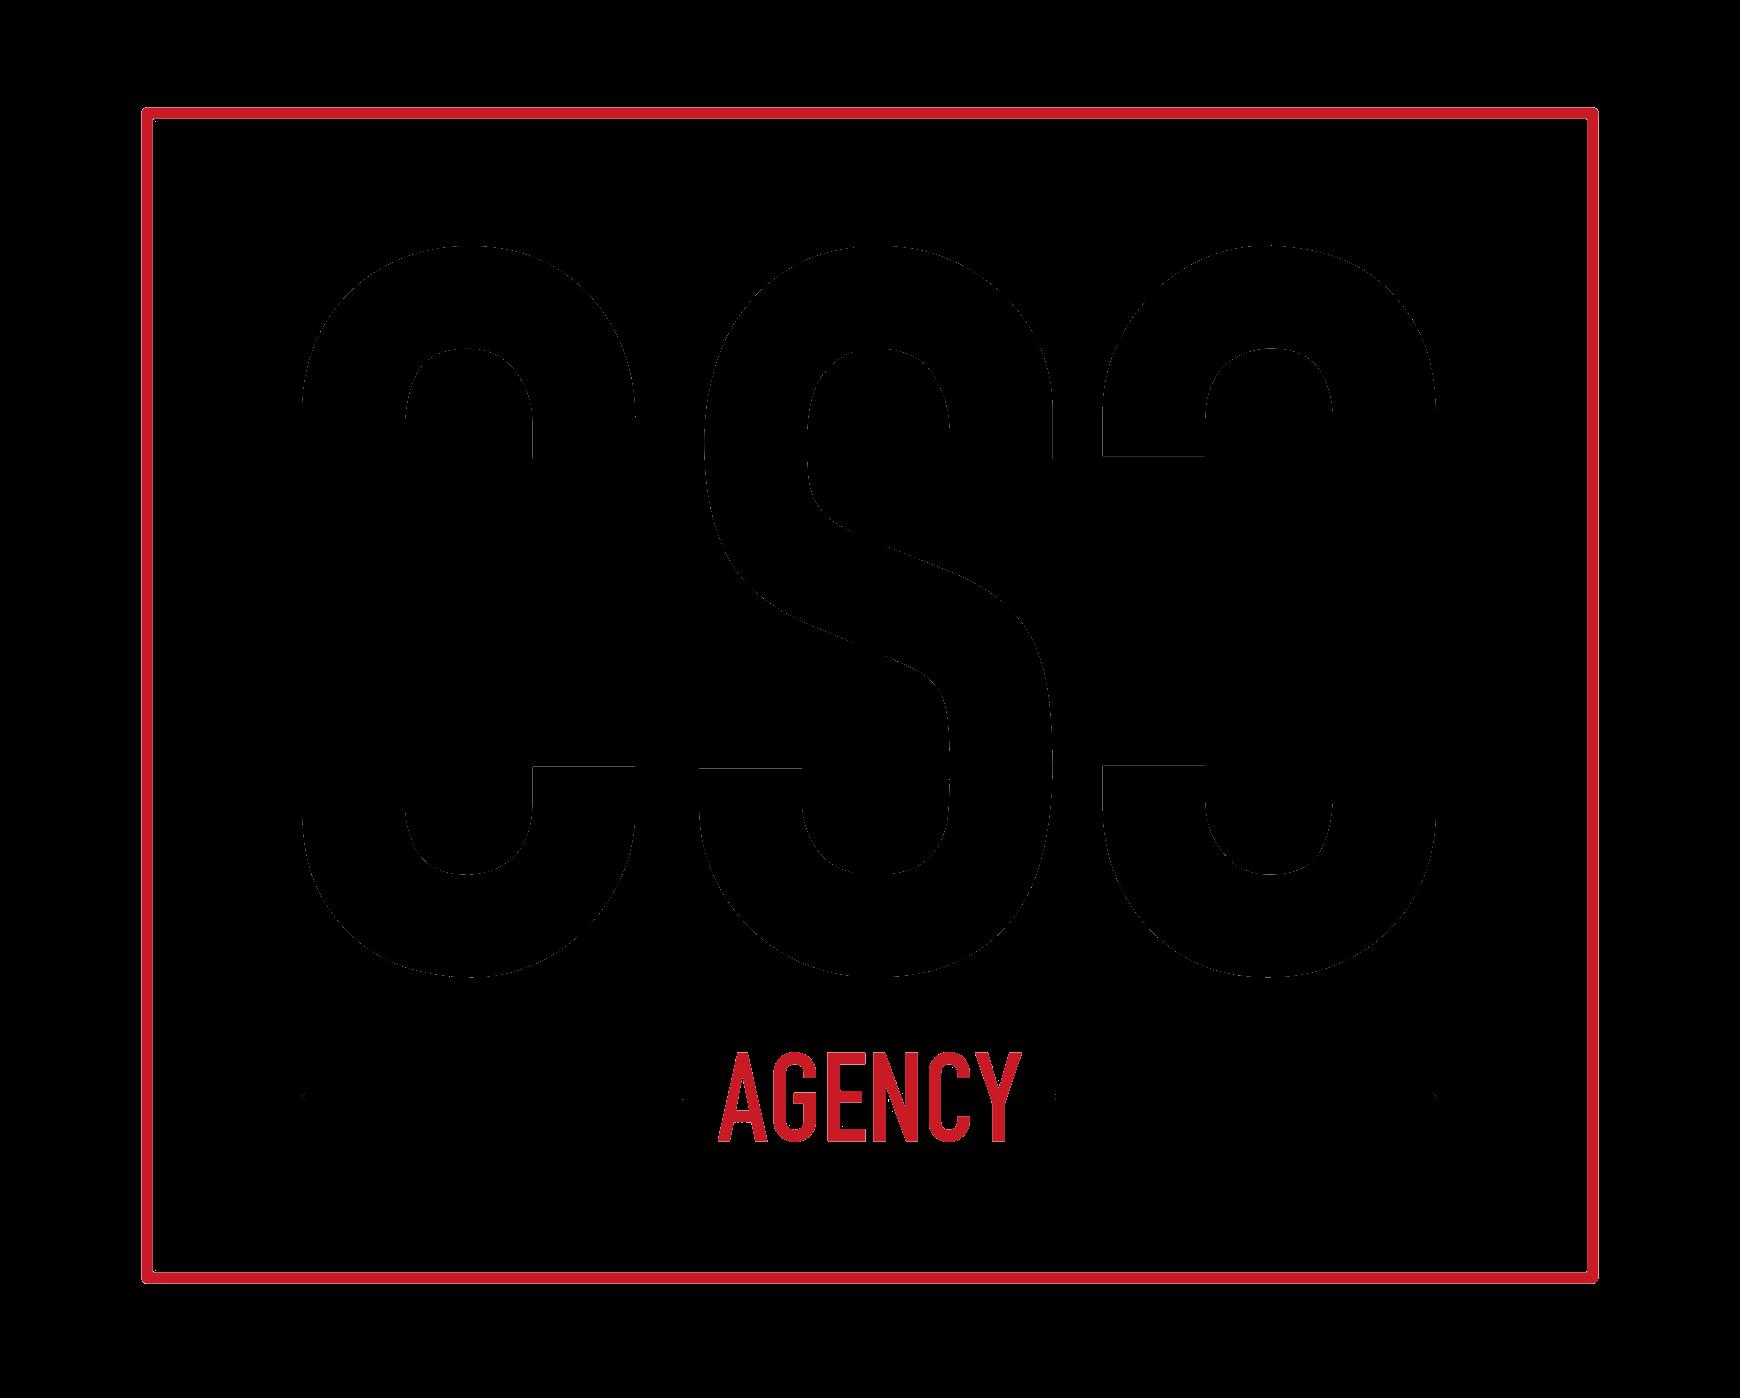 CSC AGENCY